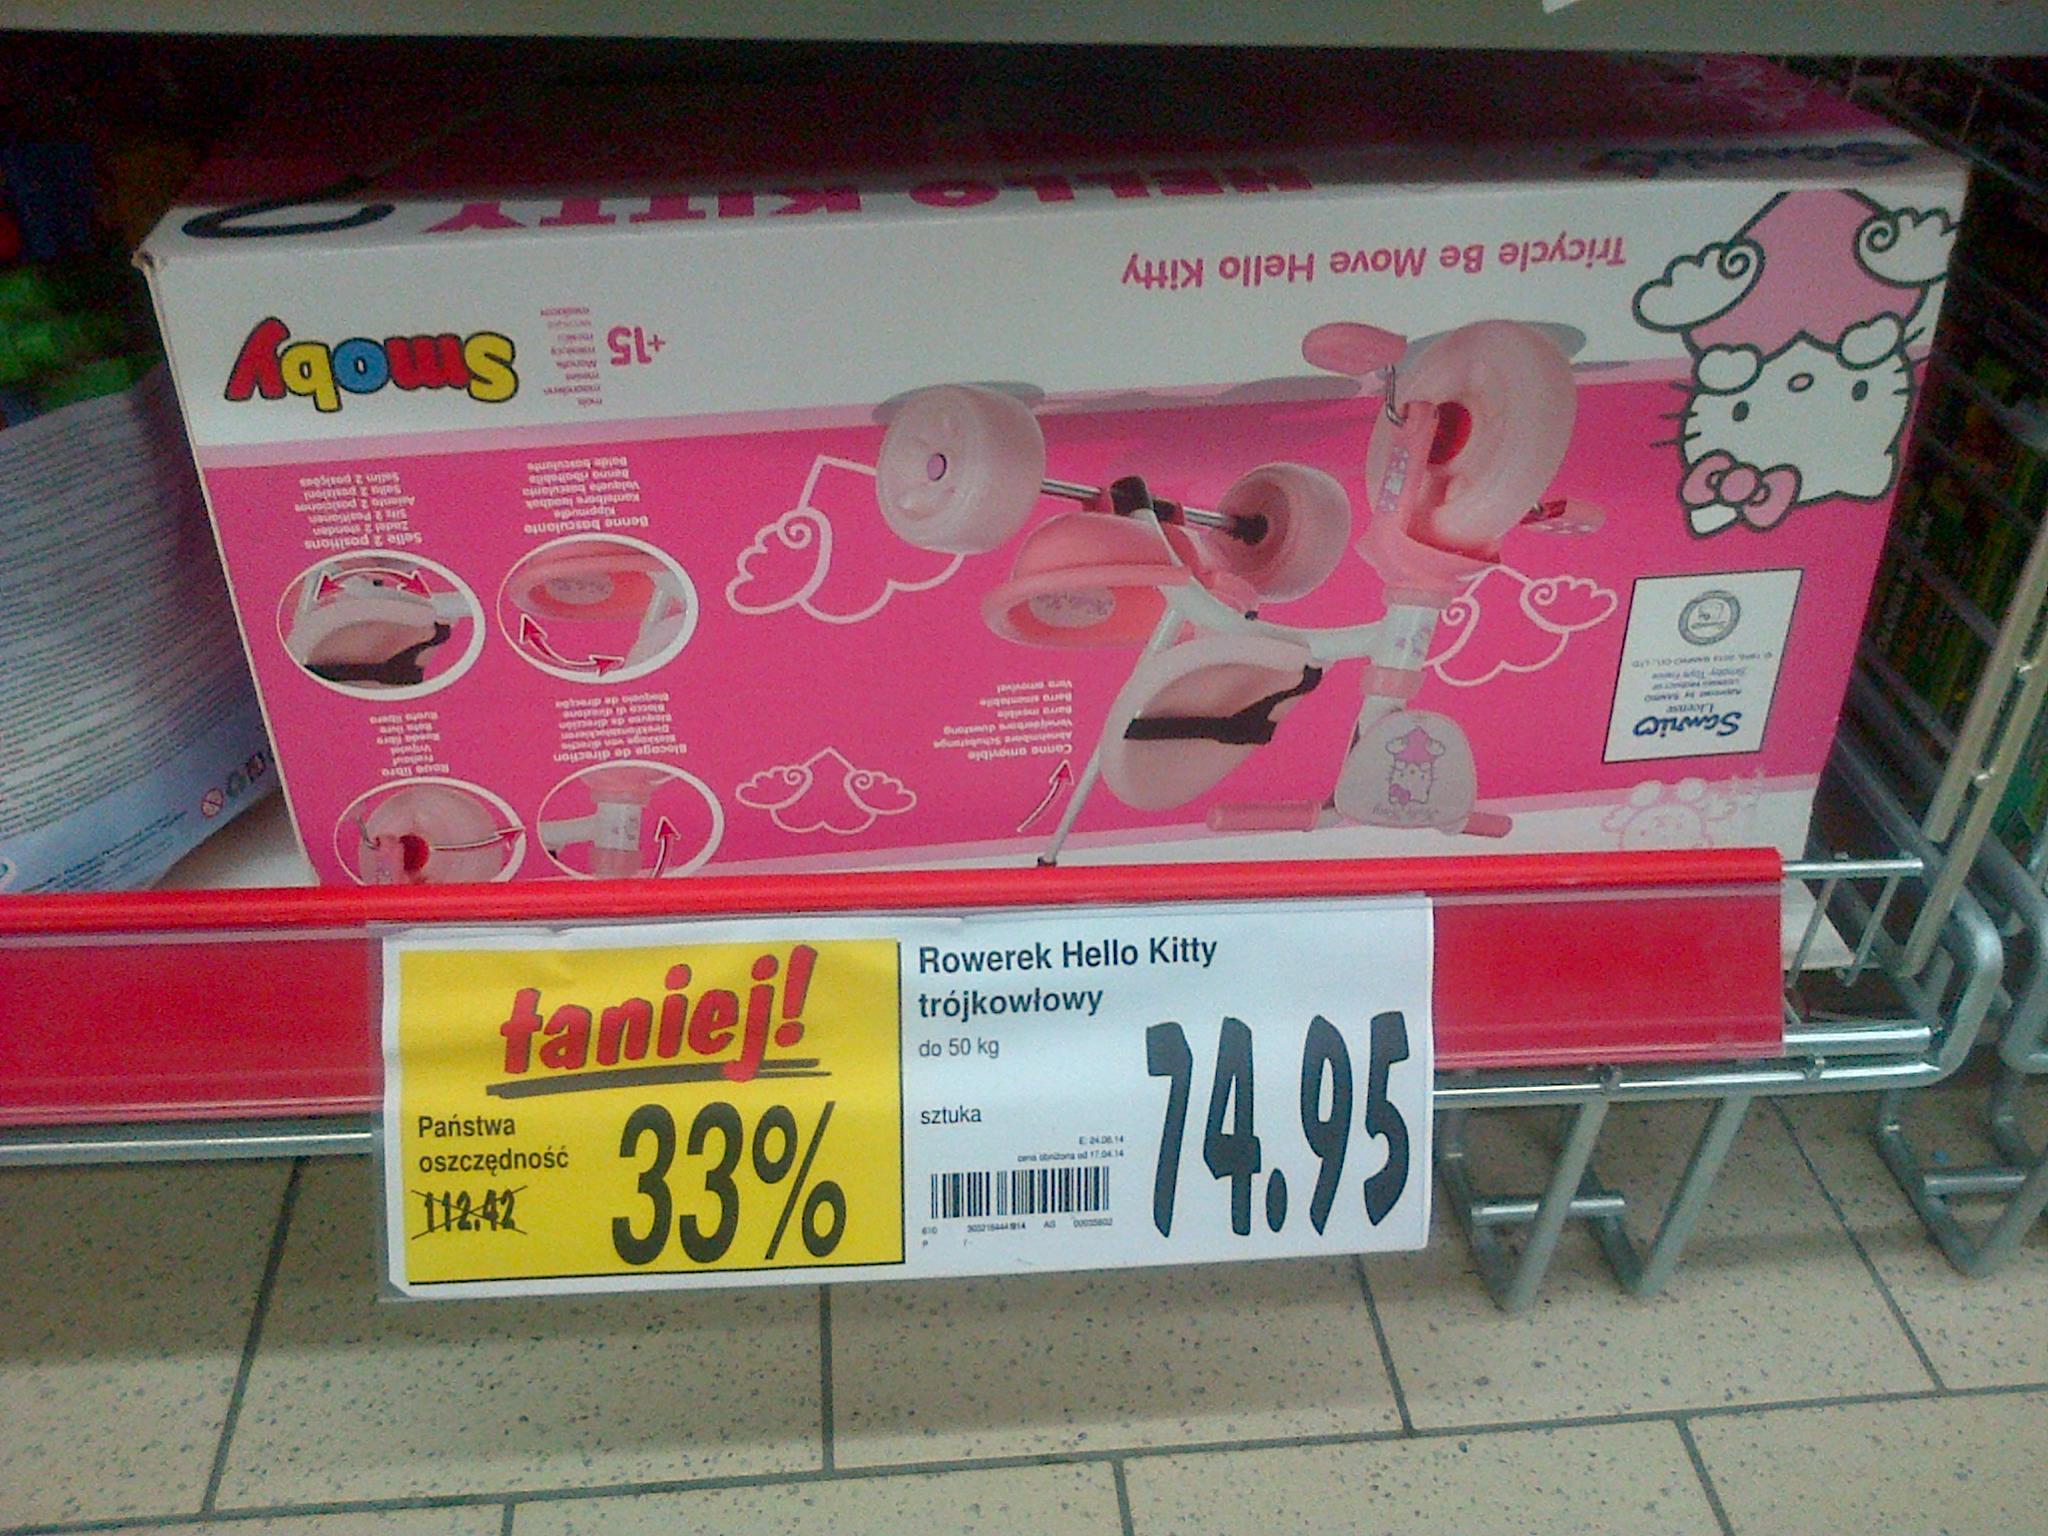 Rowerek Hello Kitty za 74,95 zł @ Kaufland